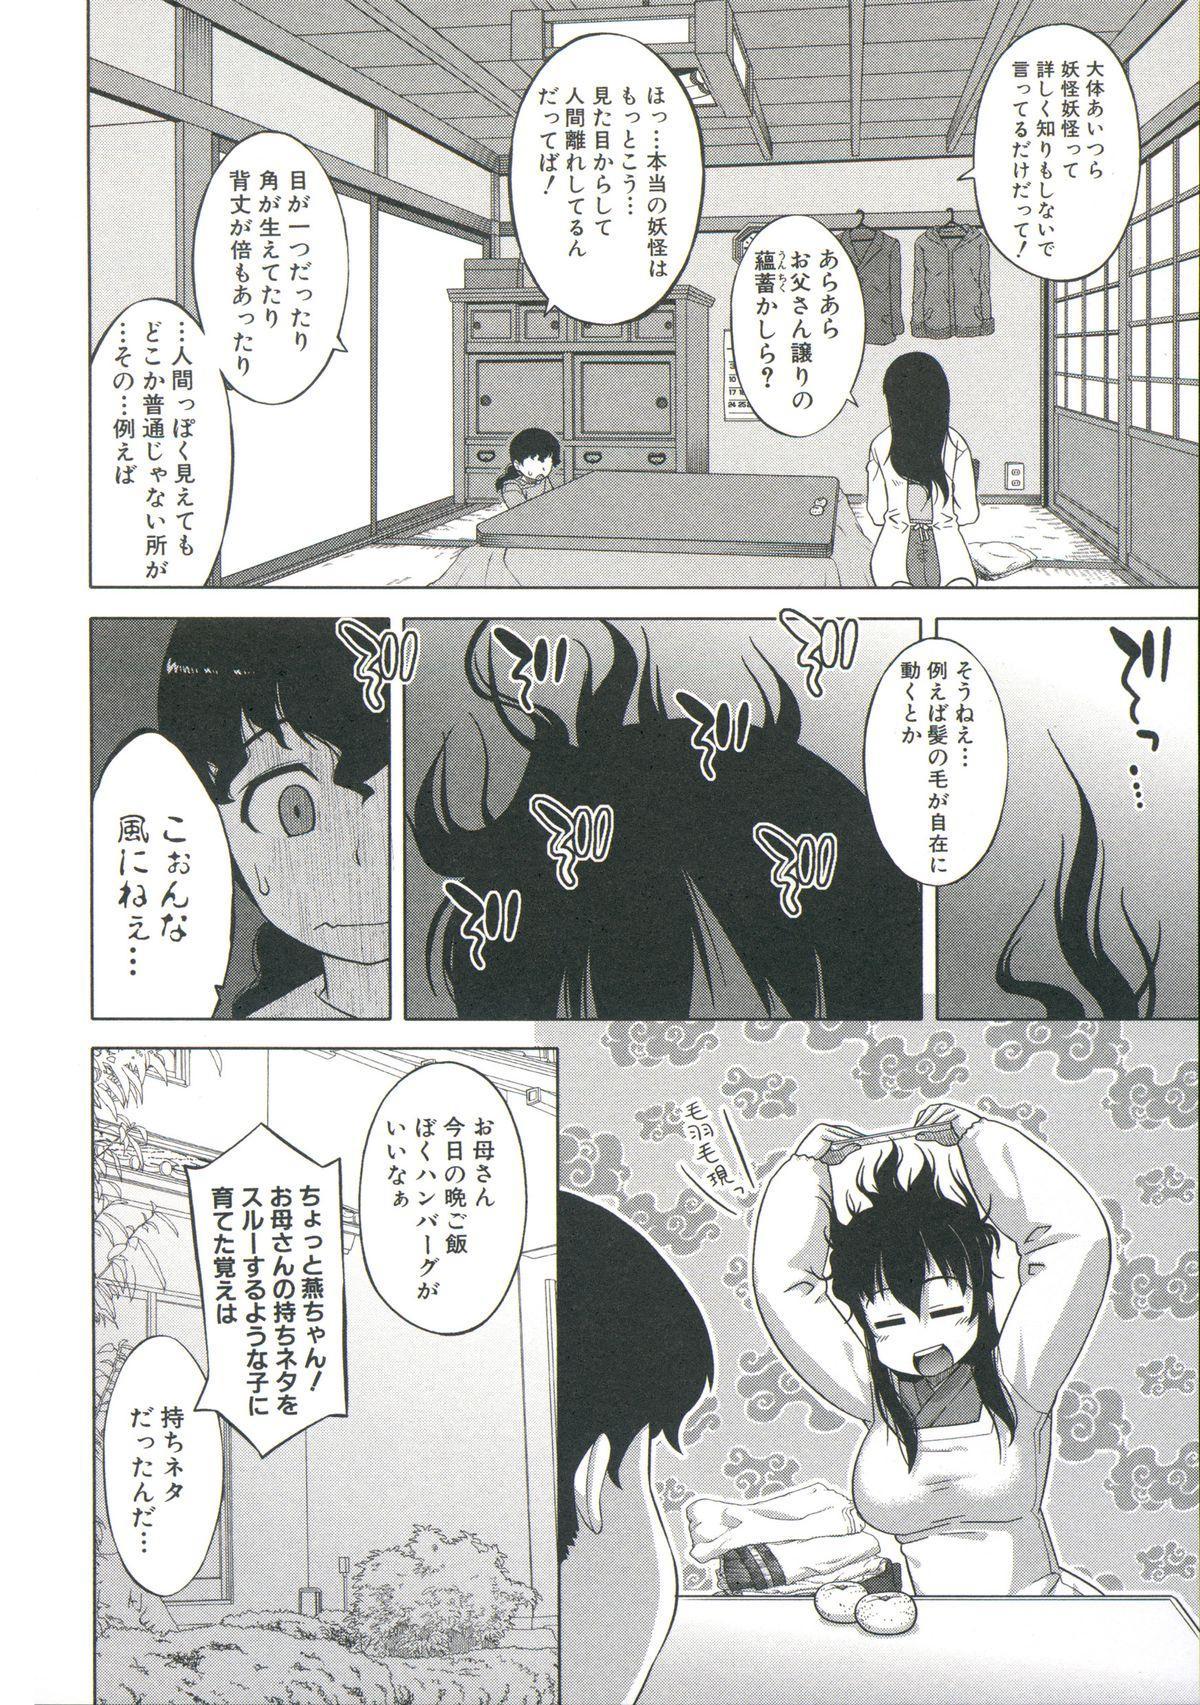 [Takatsu] Ou-sama Appli - King App 188